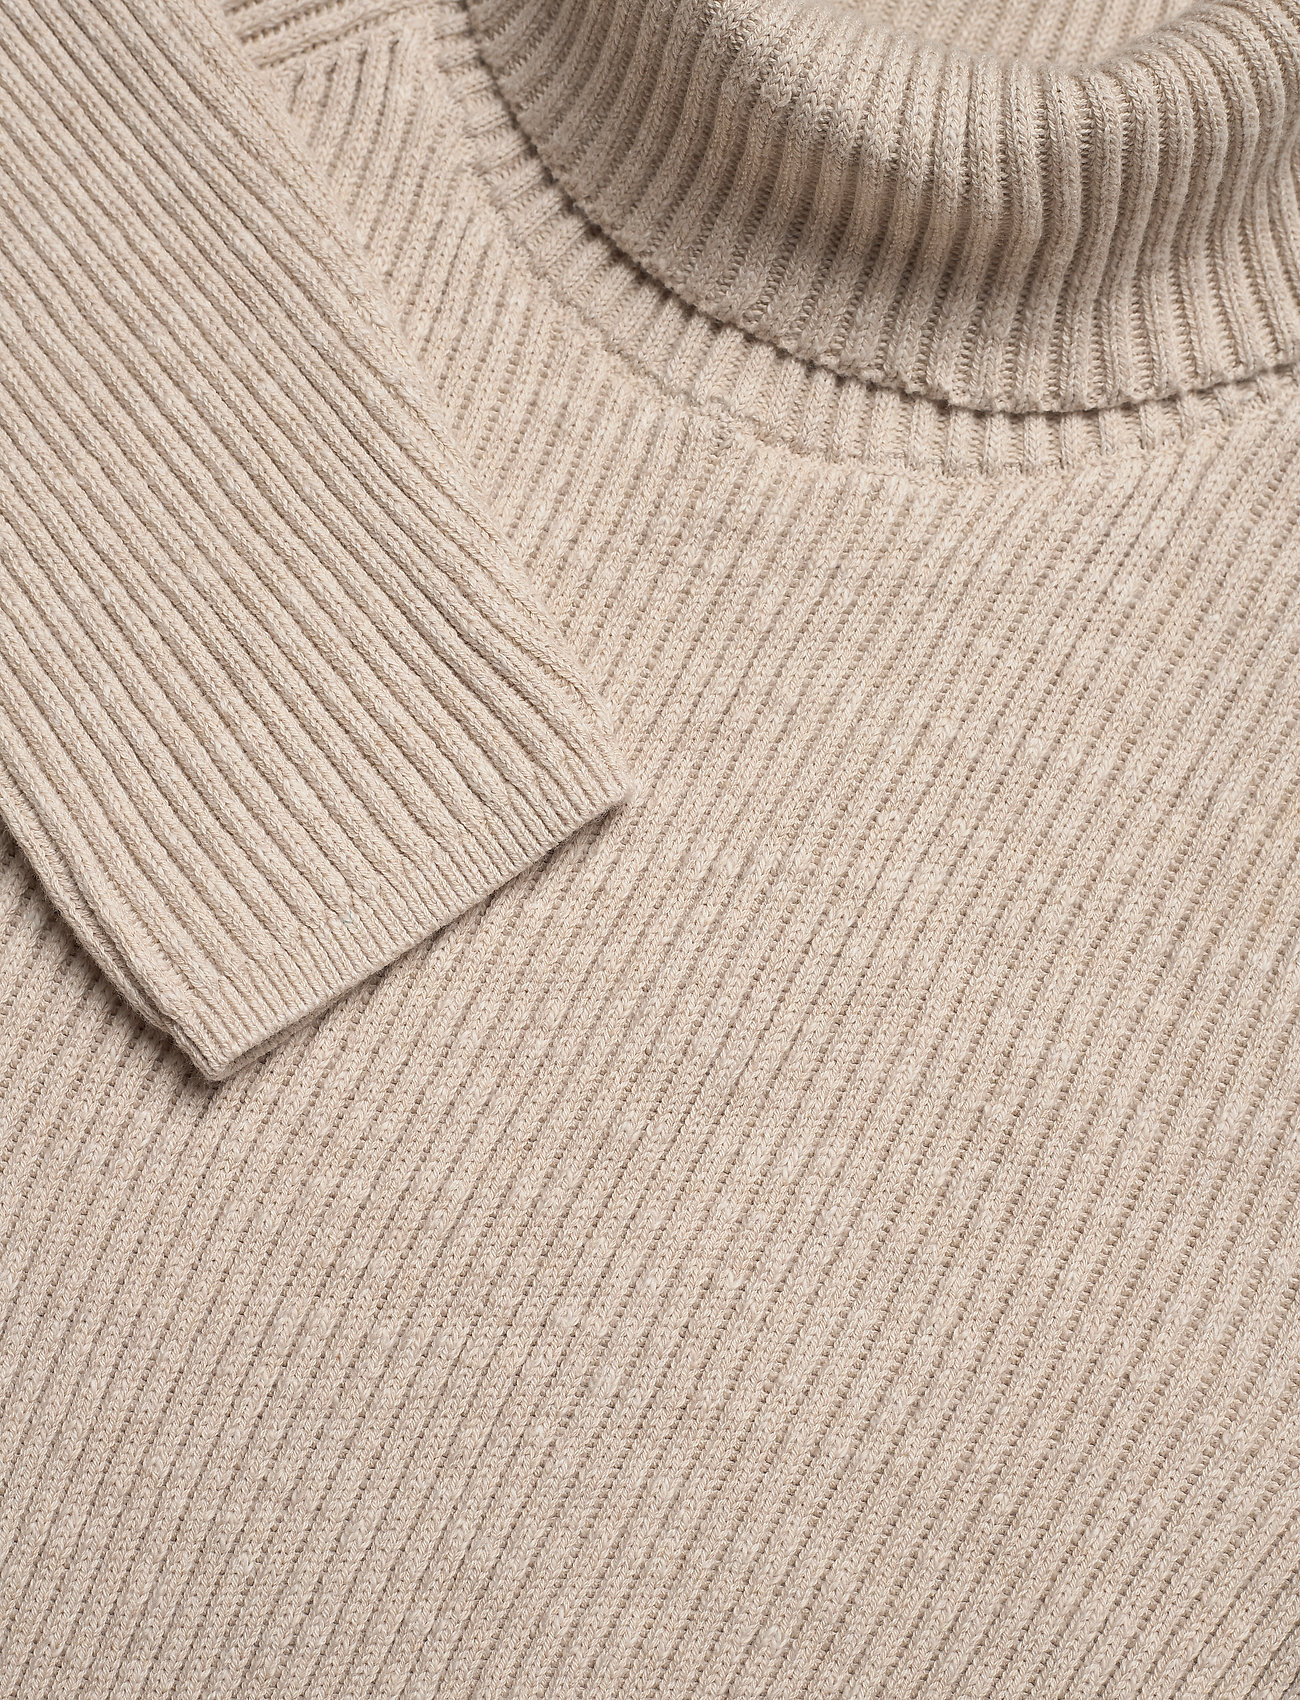 Pullover Long Sleeve (Chinchilla) (112.46 €) - Marc O'Polo FJRKa